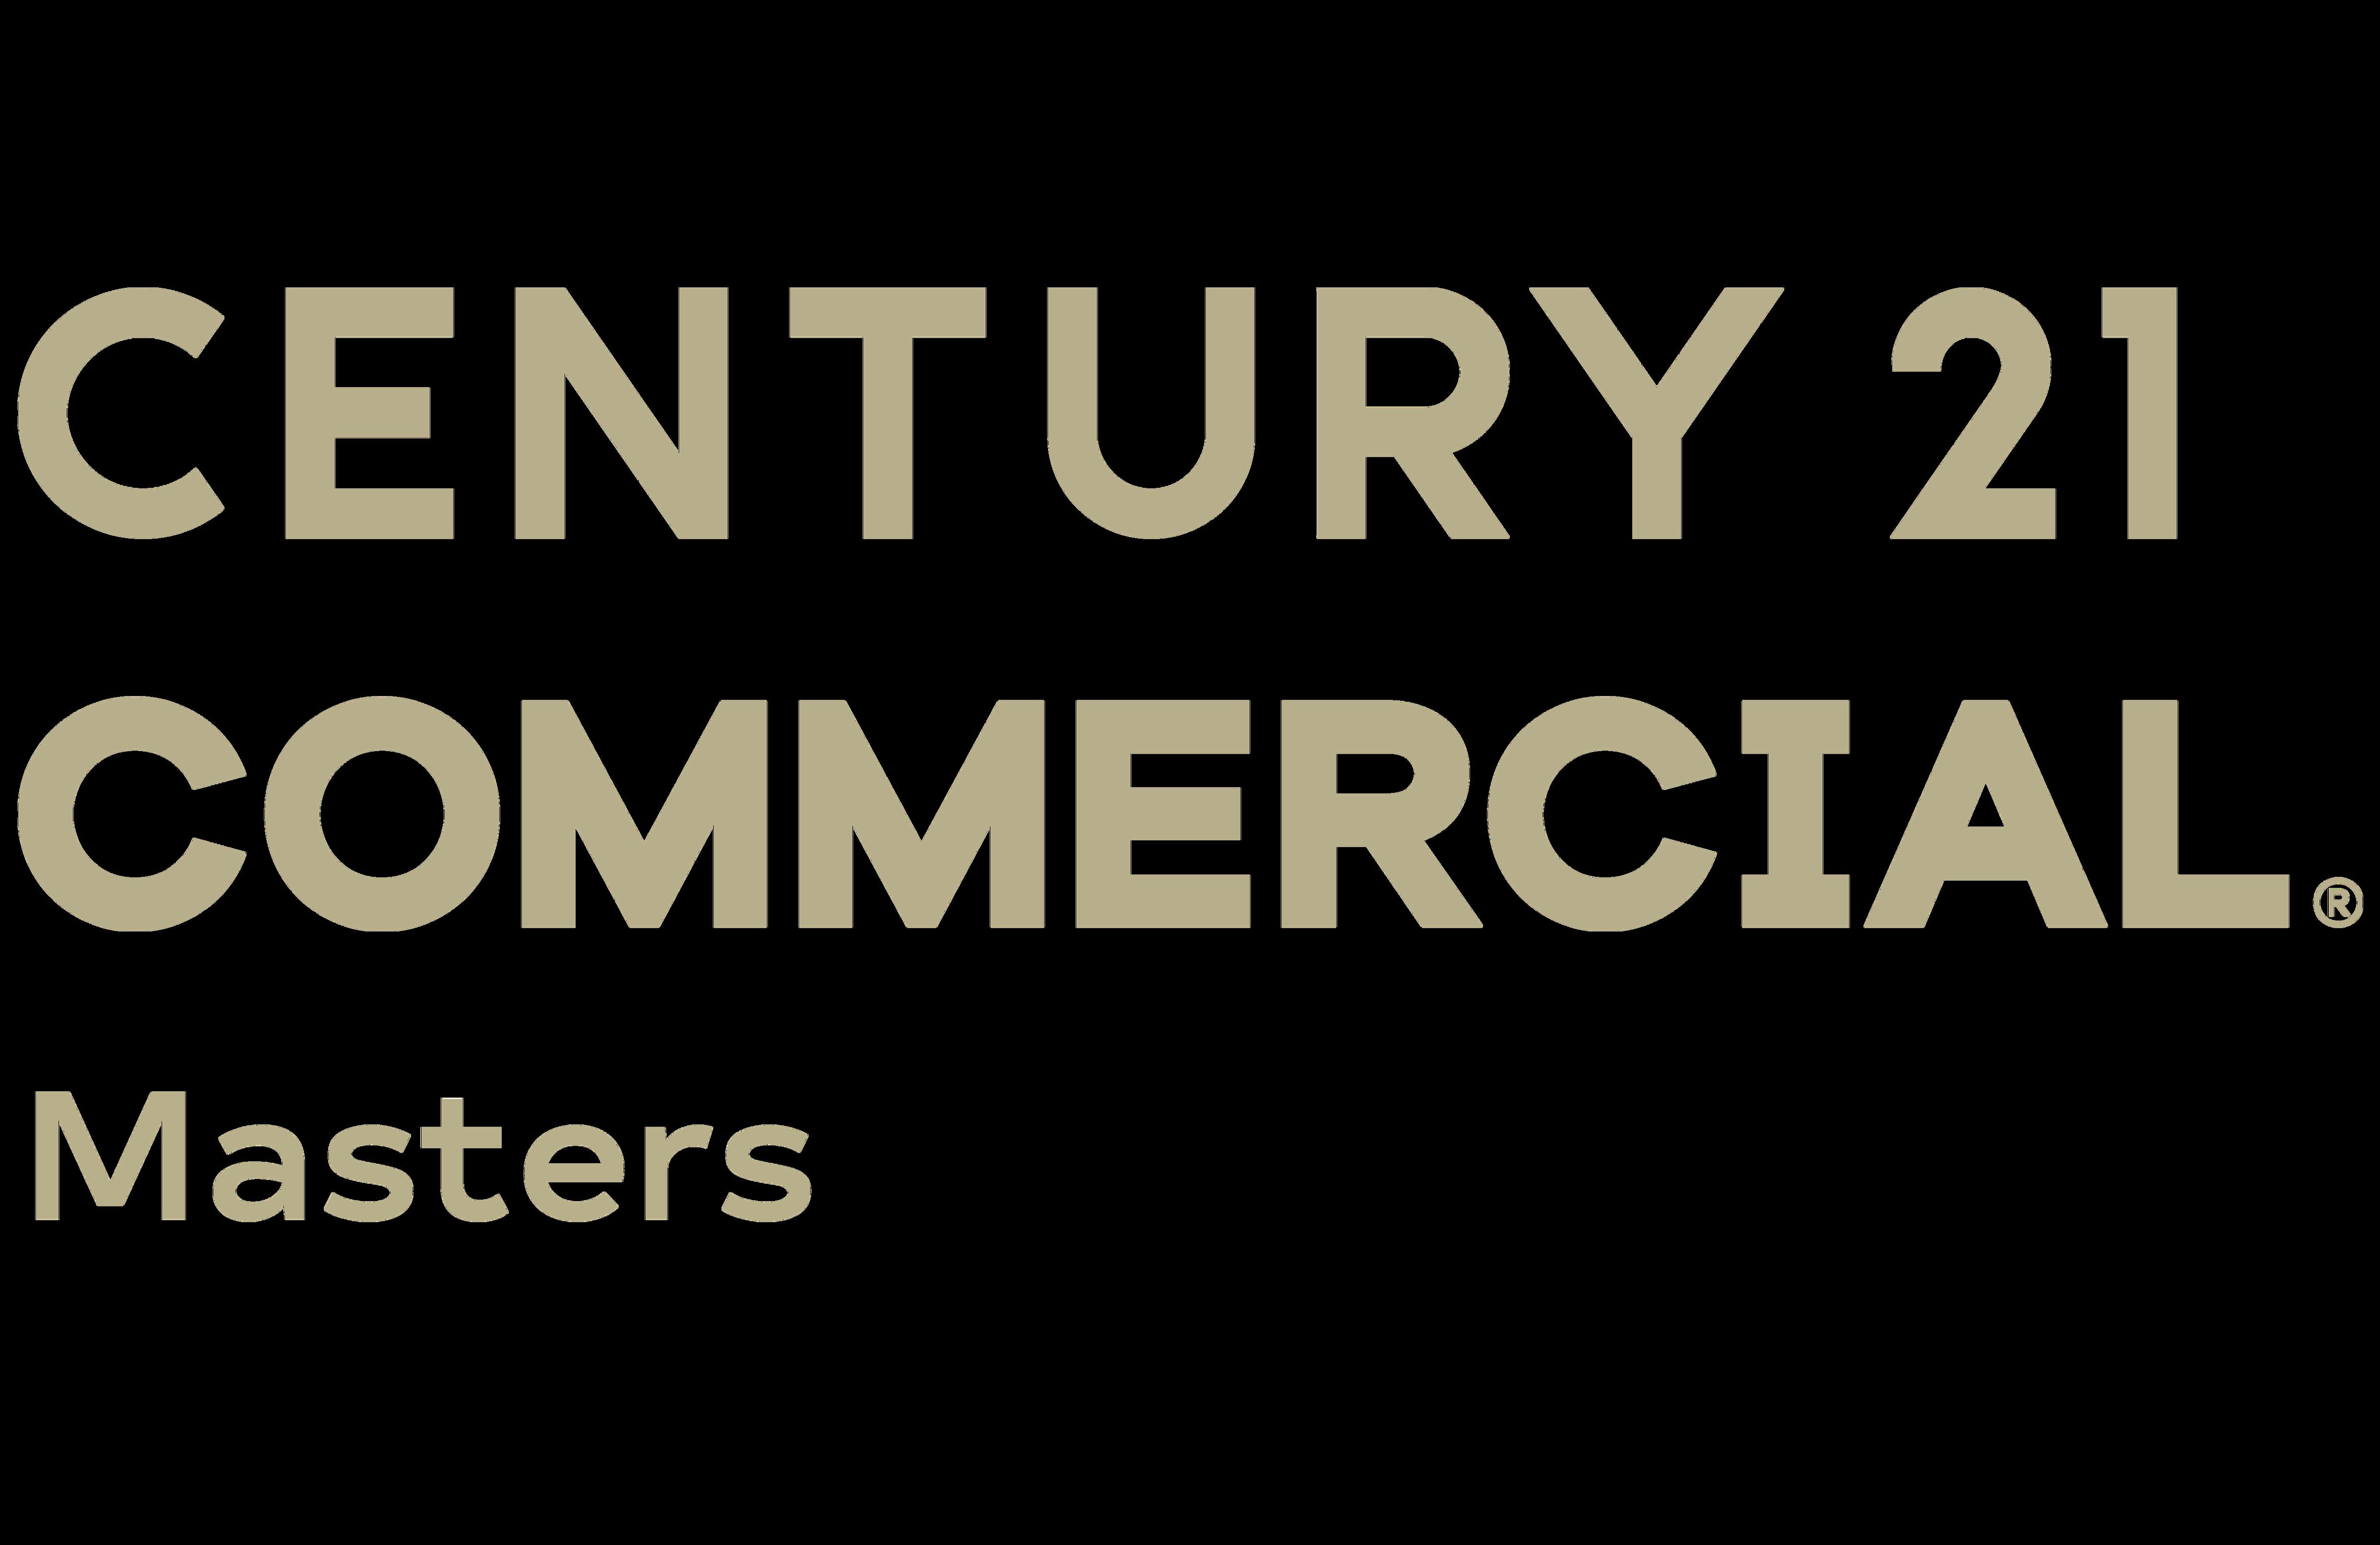 CENTURY 21 Masters